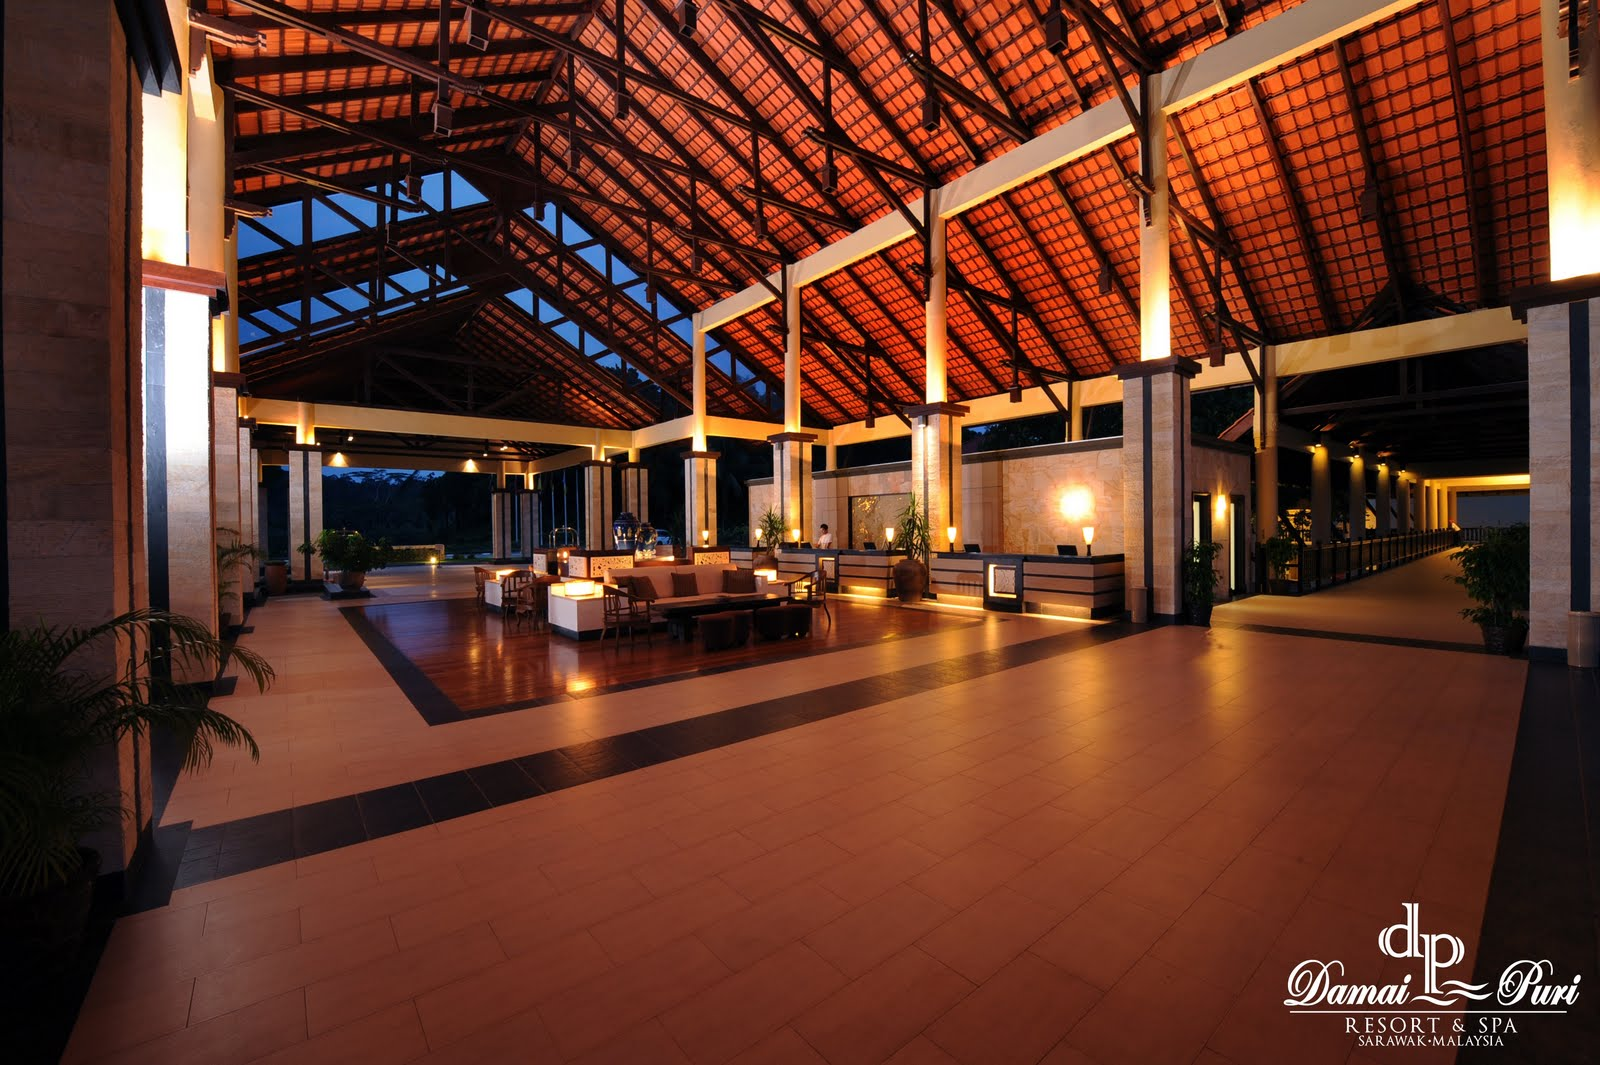 Damai Puri Resort Room Rate